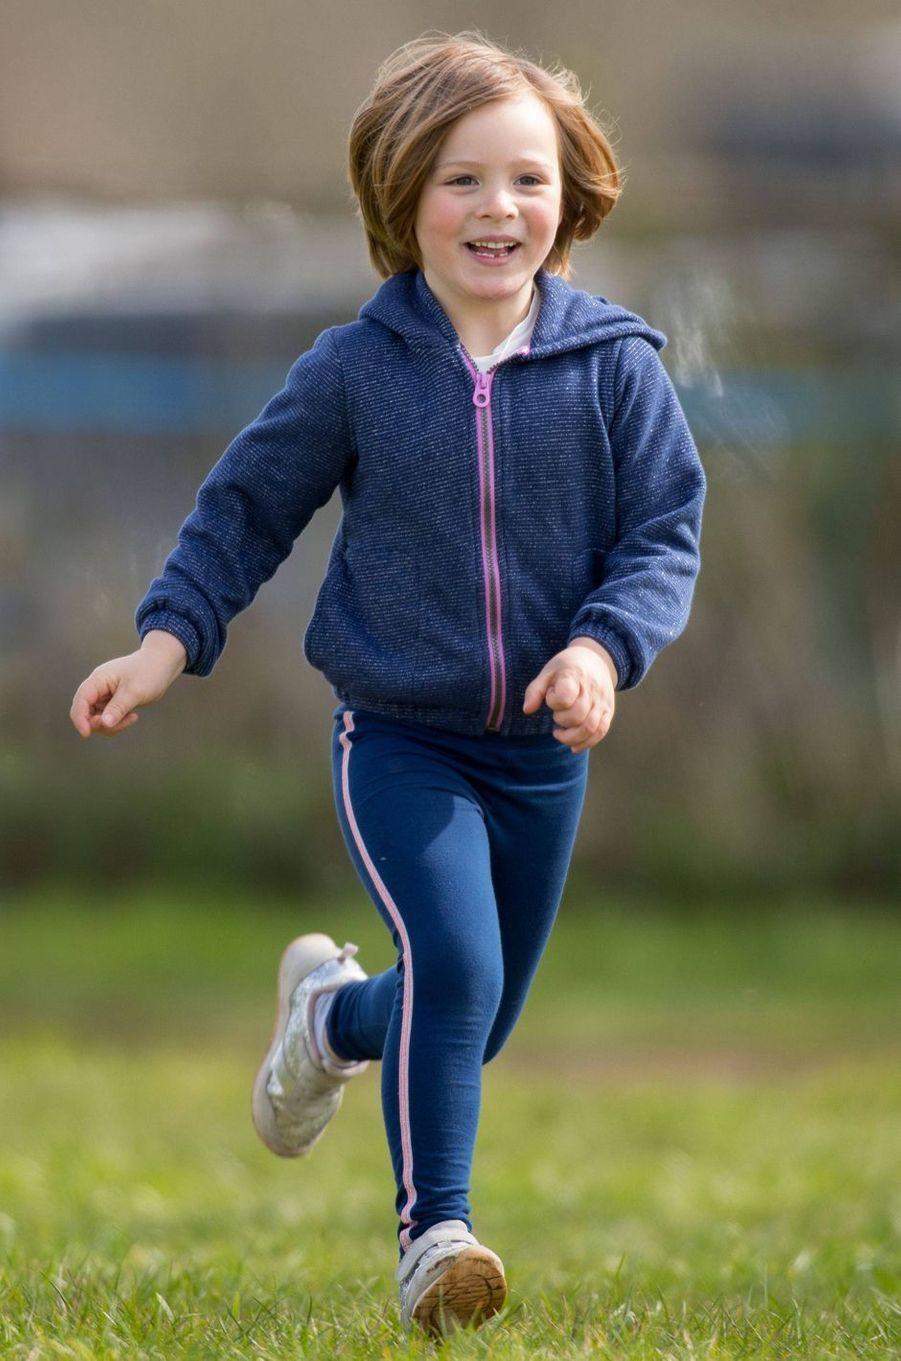 Mia Tindall, arrière-petite-fille de la reine Elizabeth II, à Gatcombe Park le 23 mars 2019